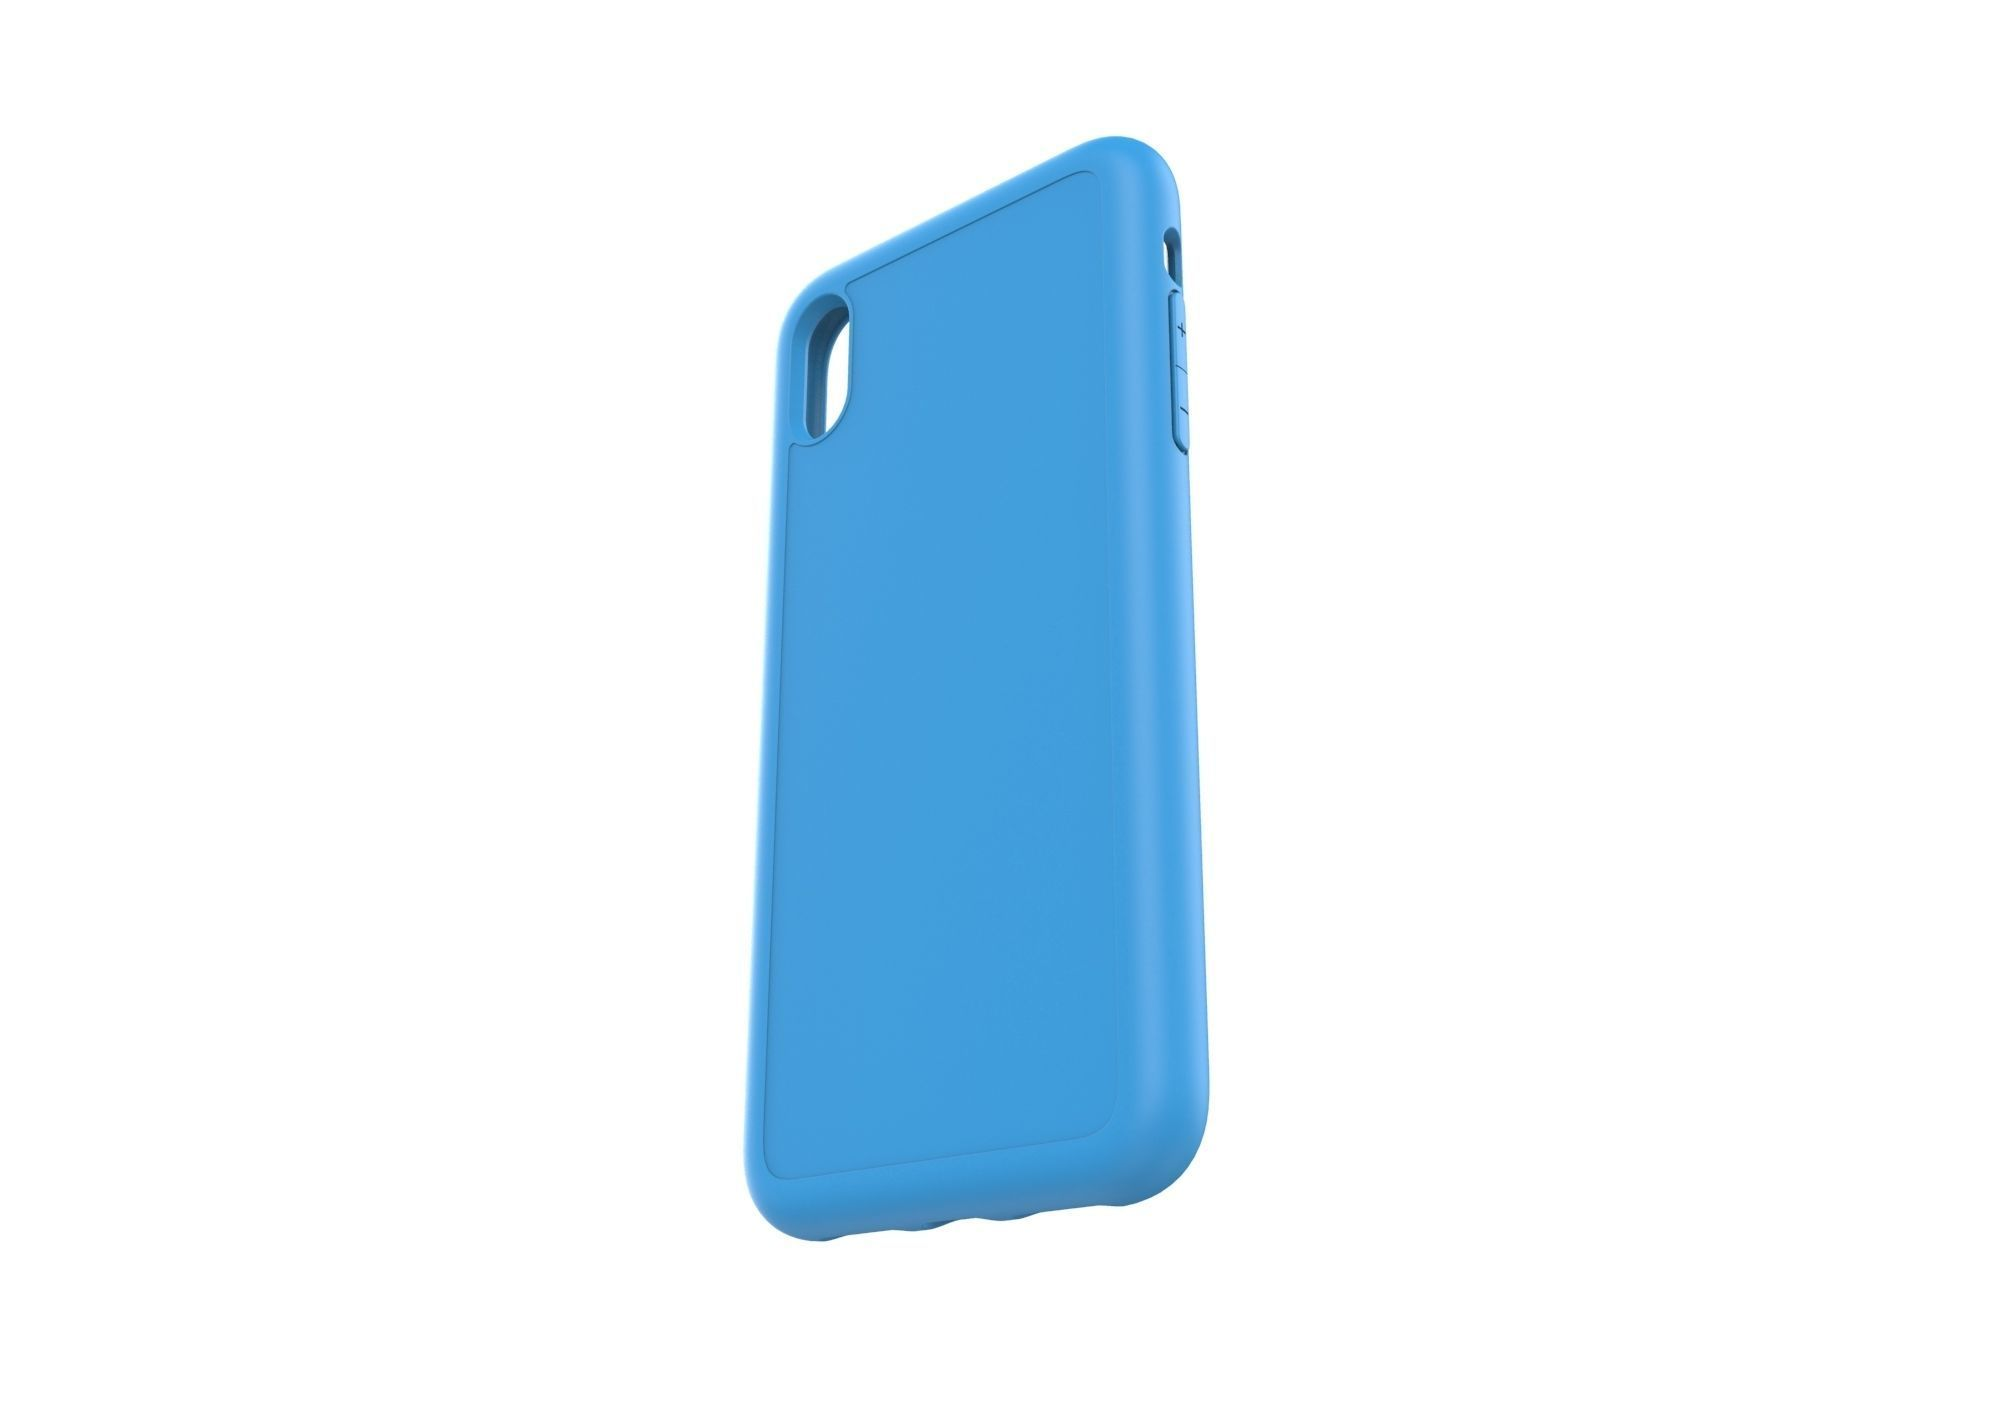 Iphone XS Max  blue case